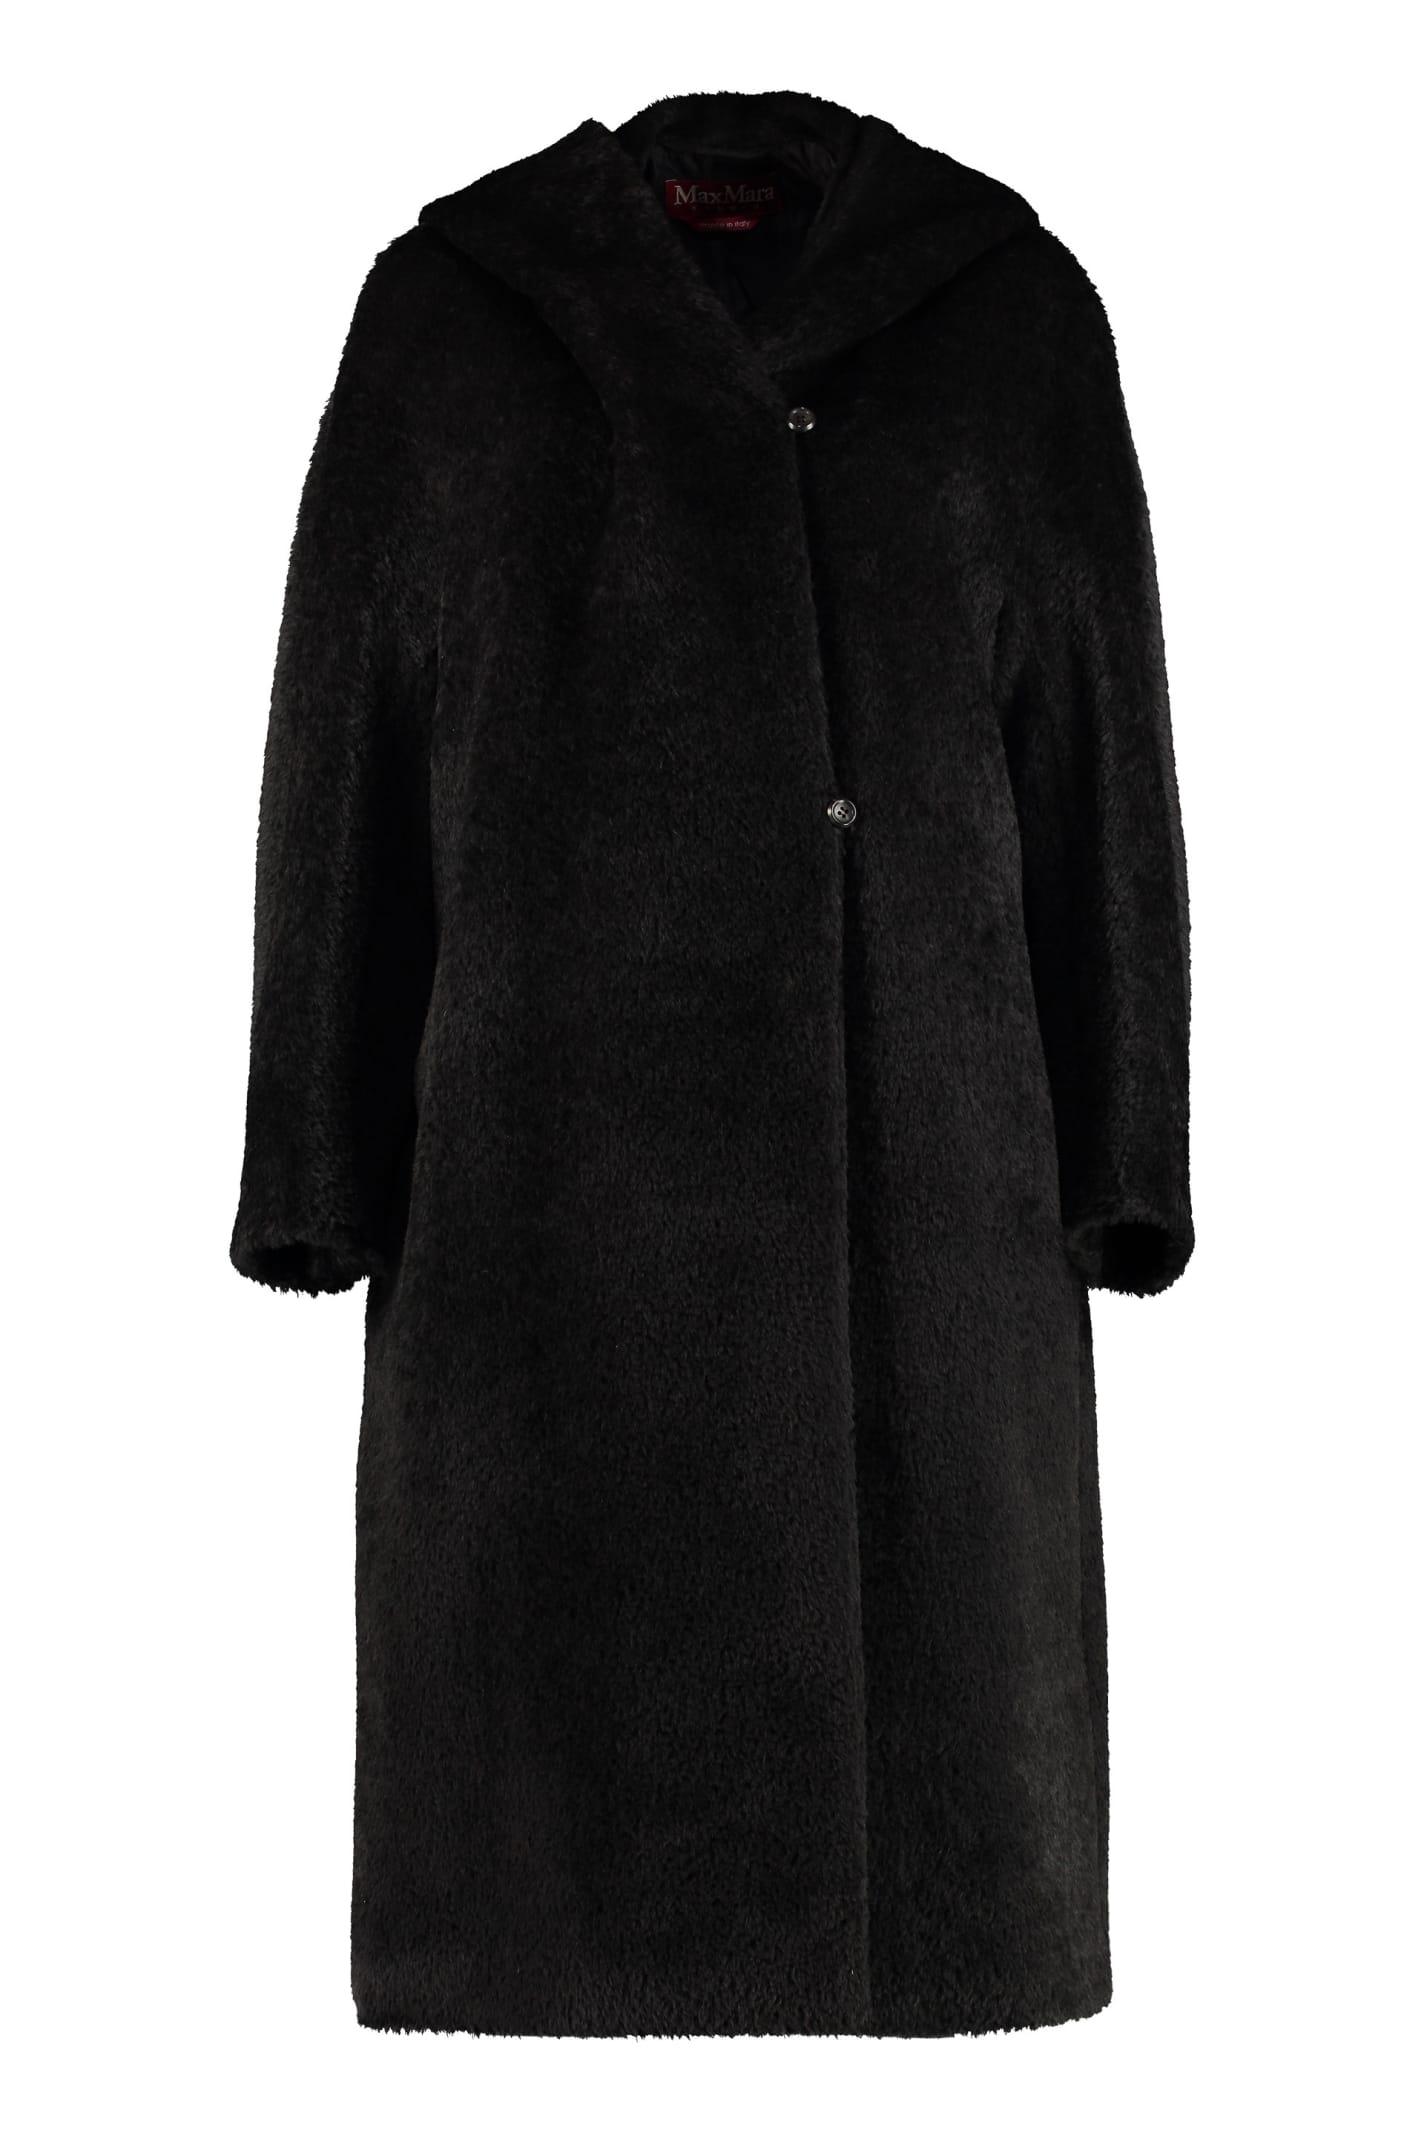 Max Mara Studio Urlo Hooded Alpaca Blend Coat